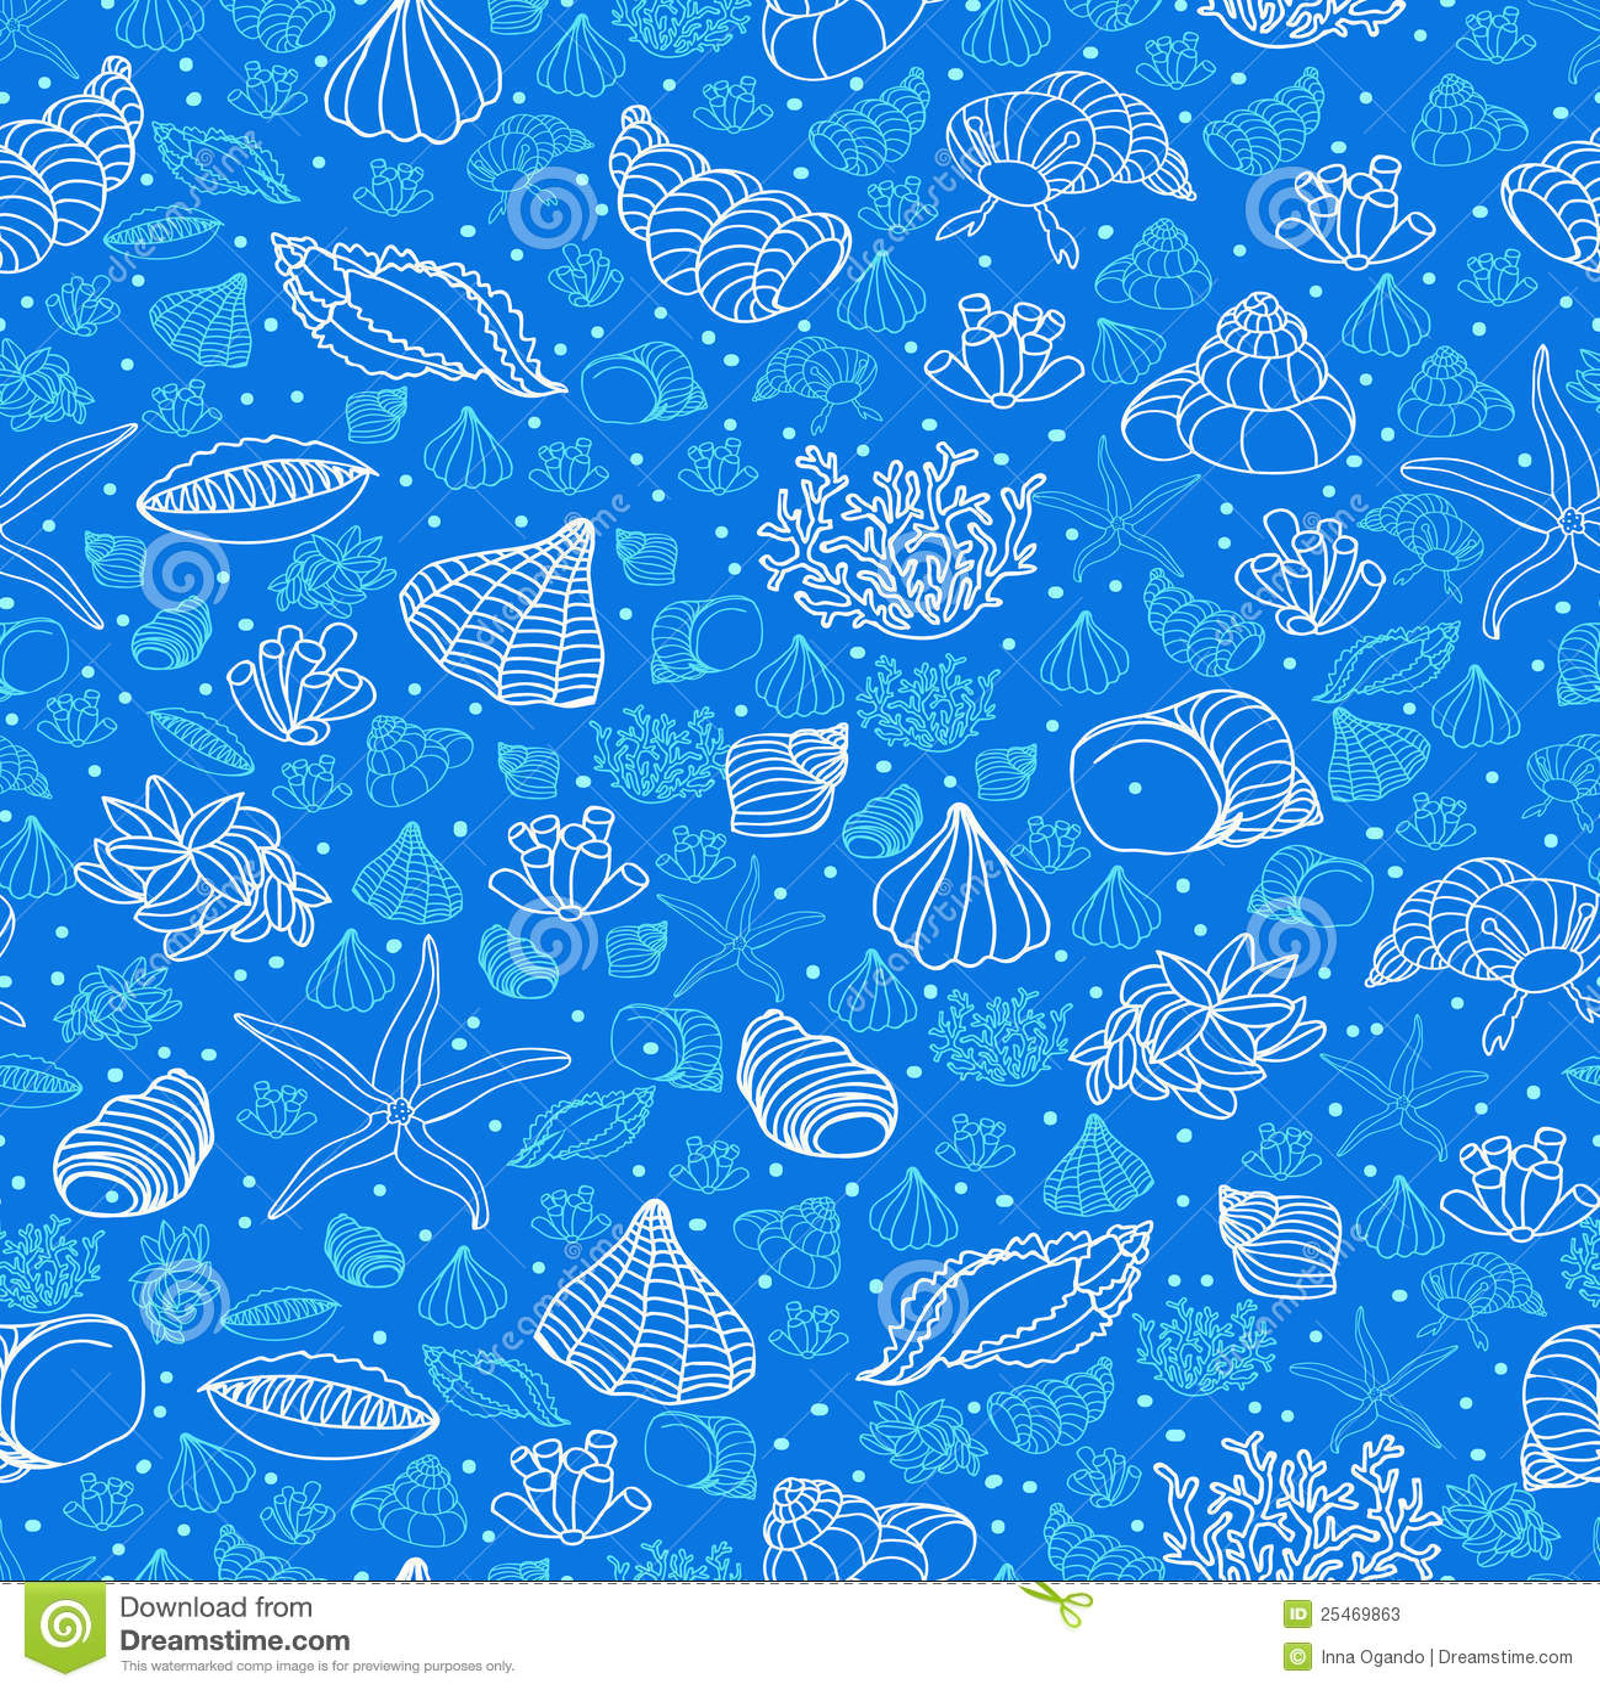 Cute Algae Wallpaper Sea Pattern Stock Vector Illustration Of Cute Seascape